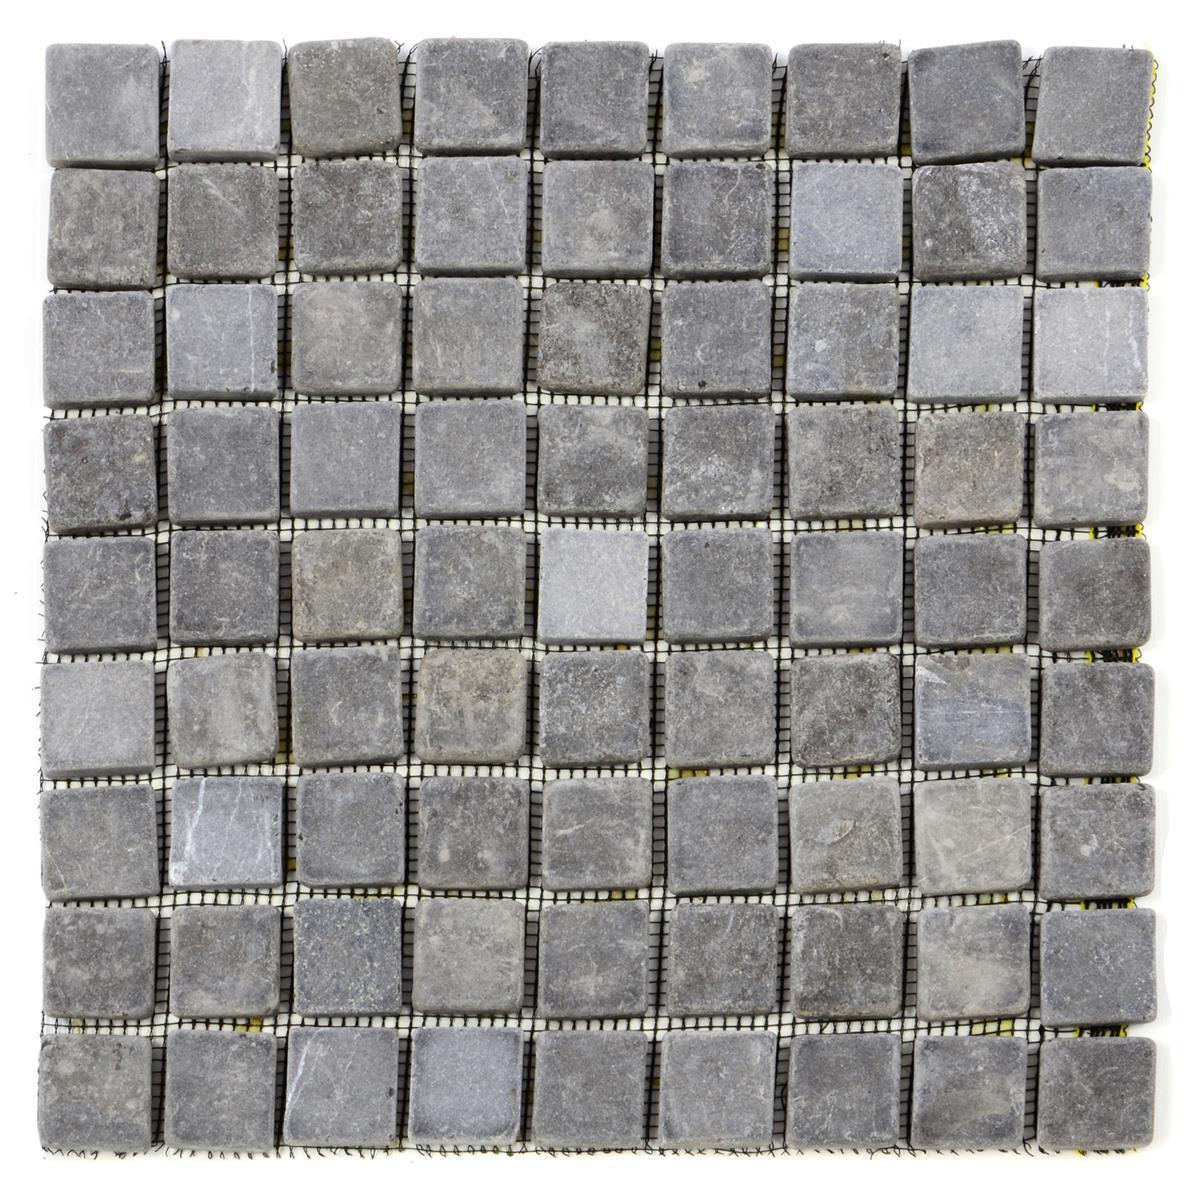 DIVERO 11 Fliesenmatten Mosaikfliesen Marmor grau á 29 x 29 cm